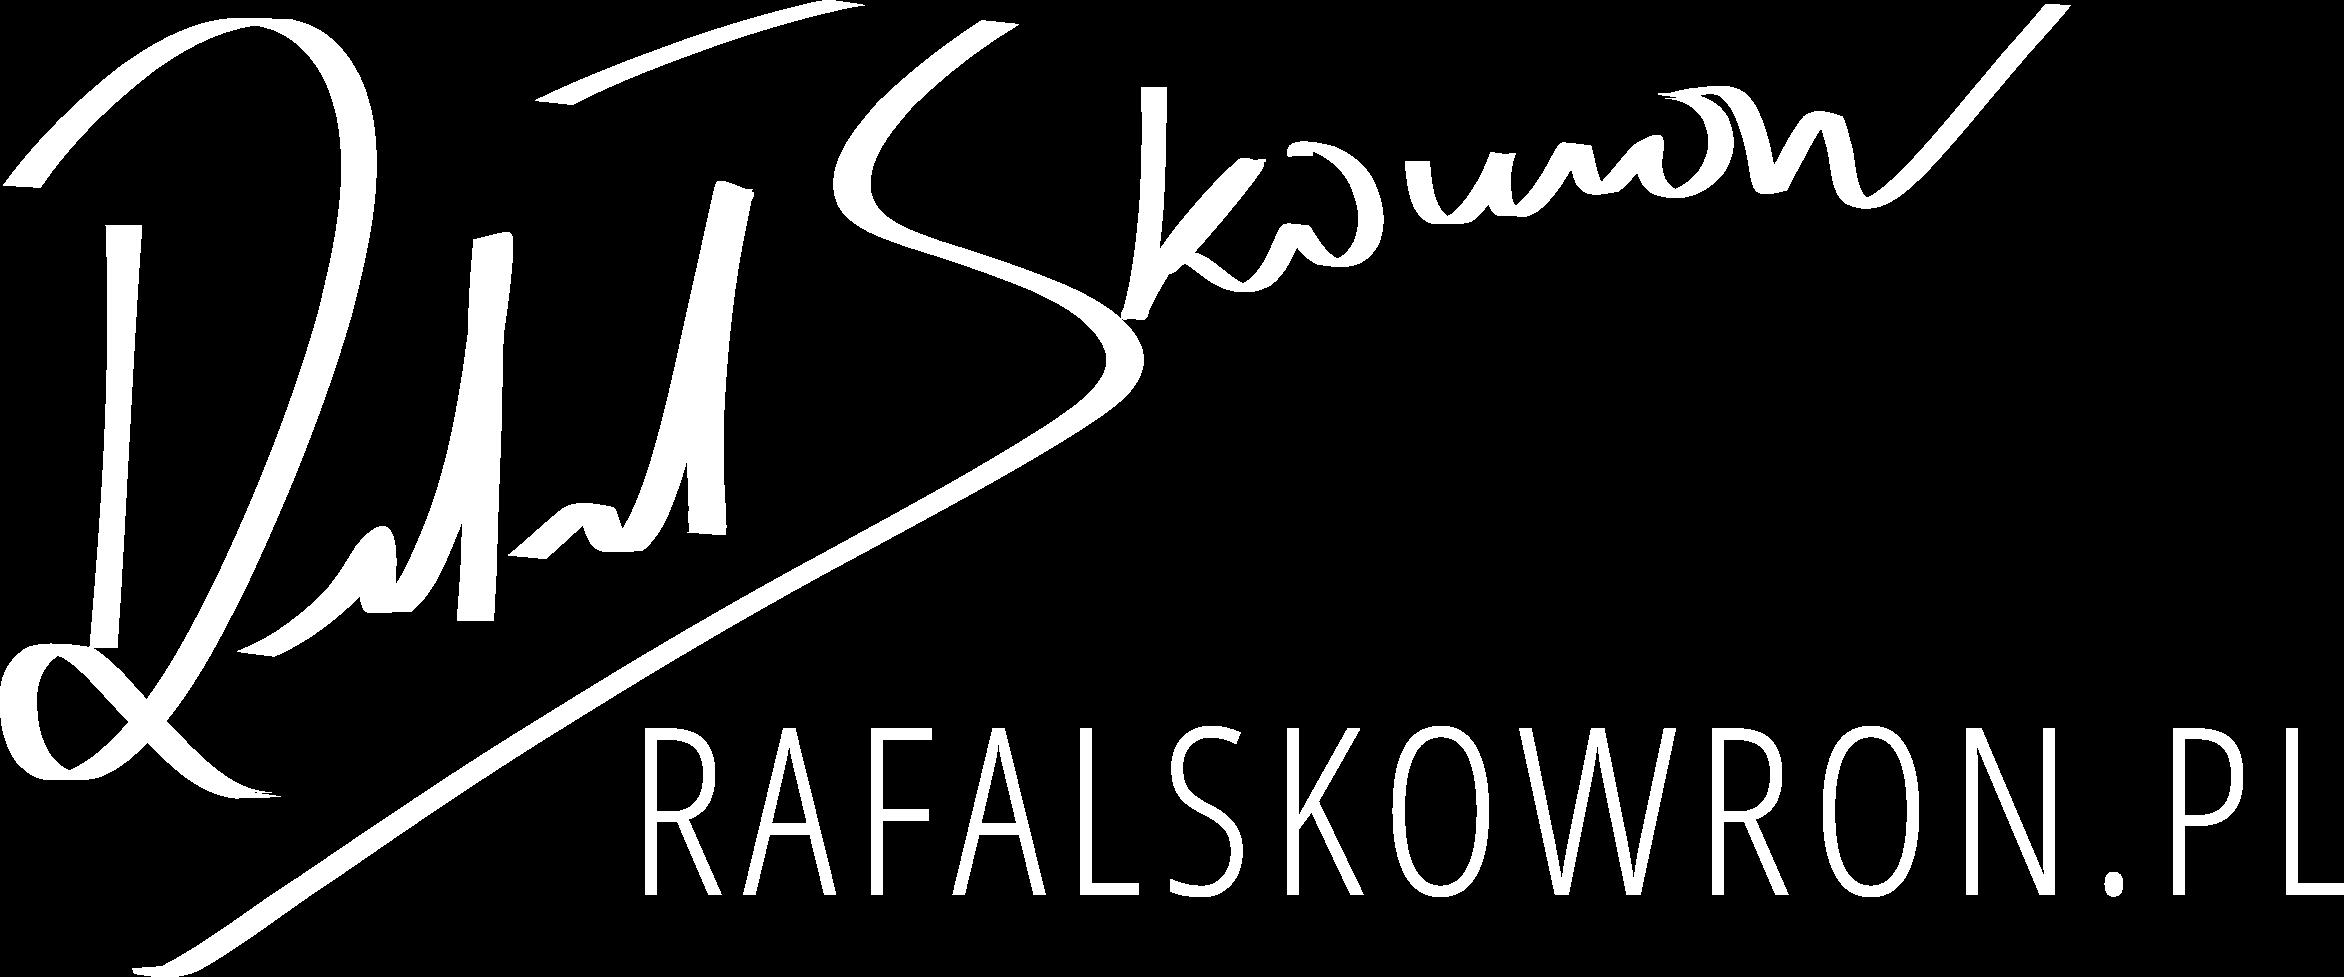 RafałSkowron.pl